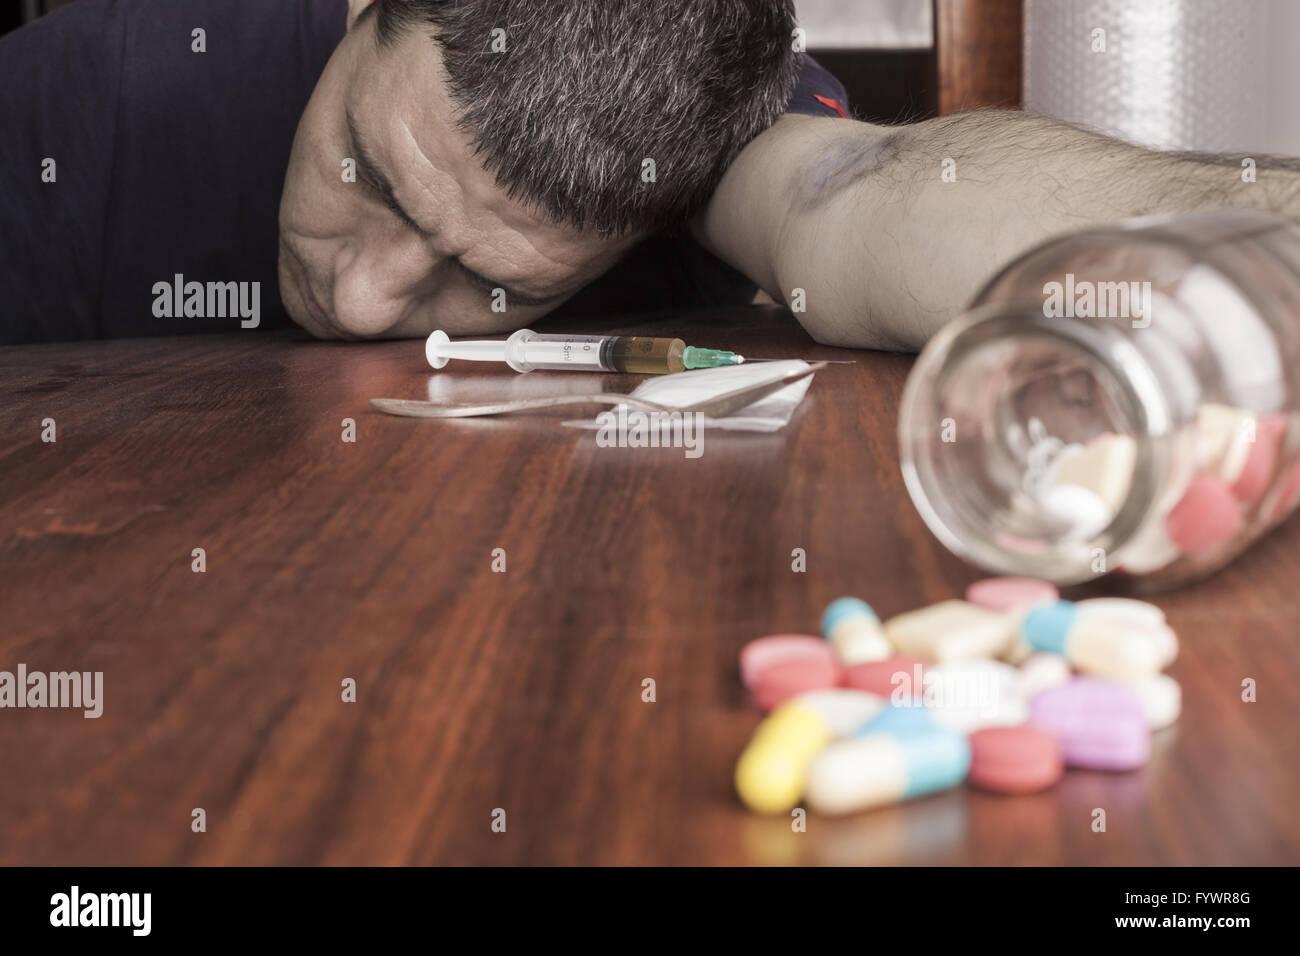 Overdose - Stock Image